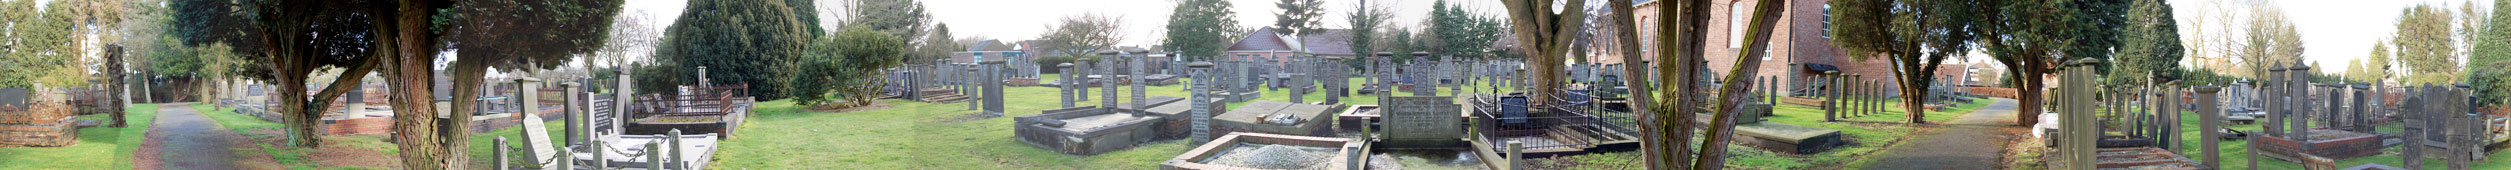 Begraafplaats Wedderweg